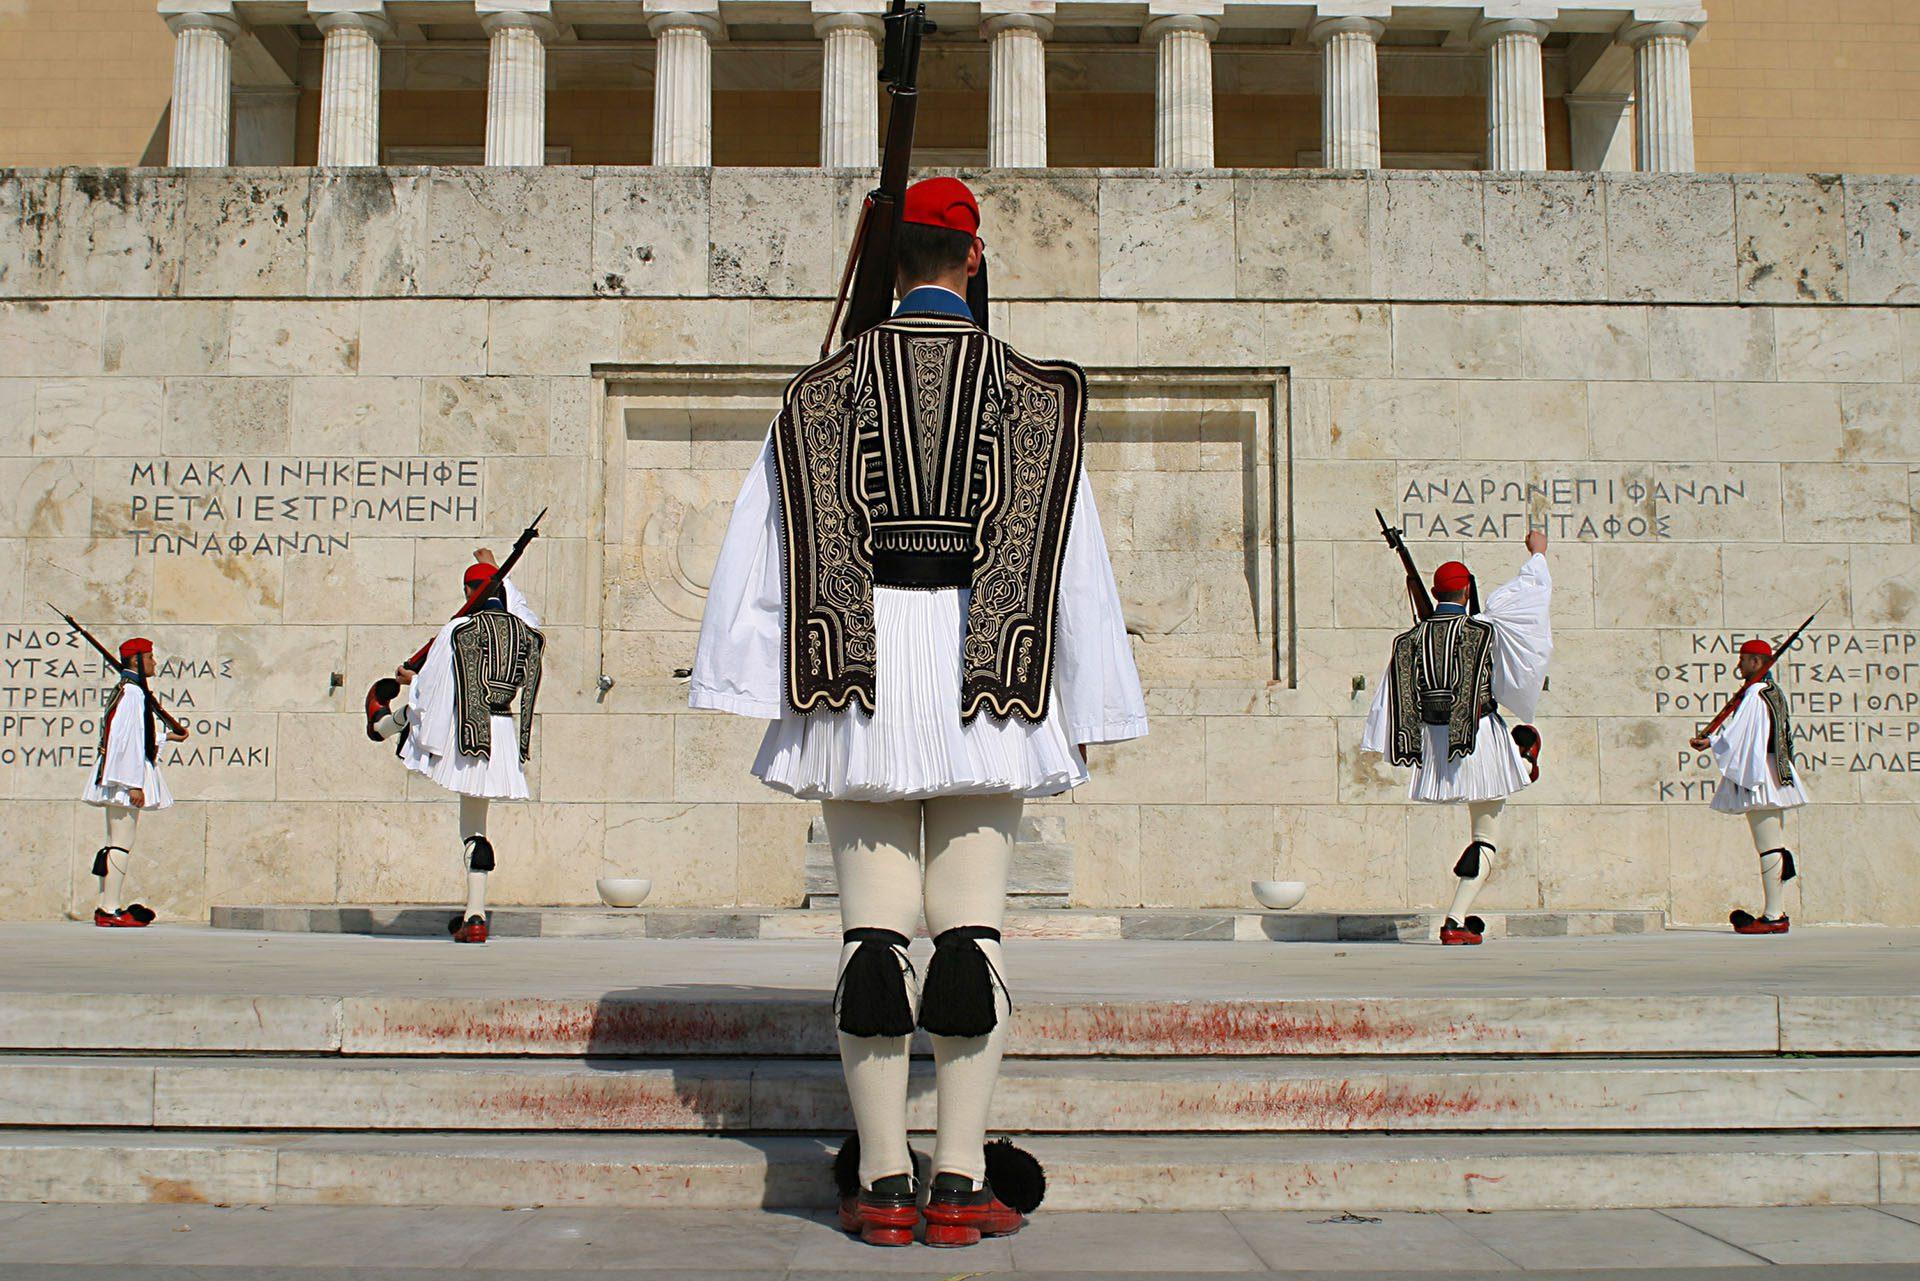 Destination gay d'Athènes